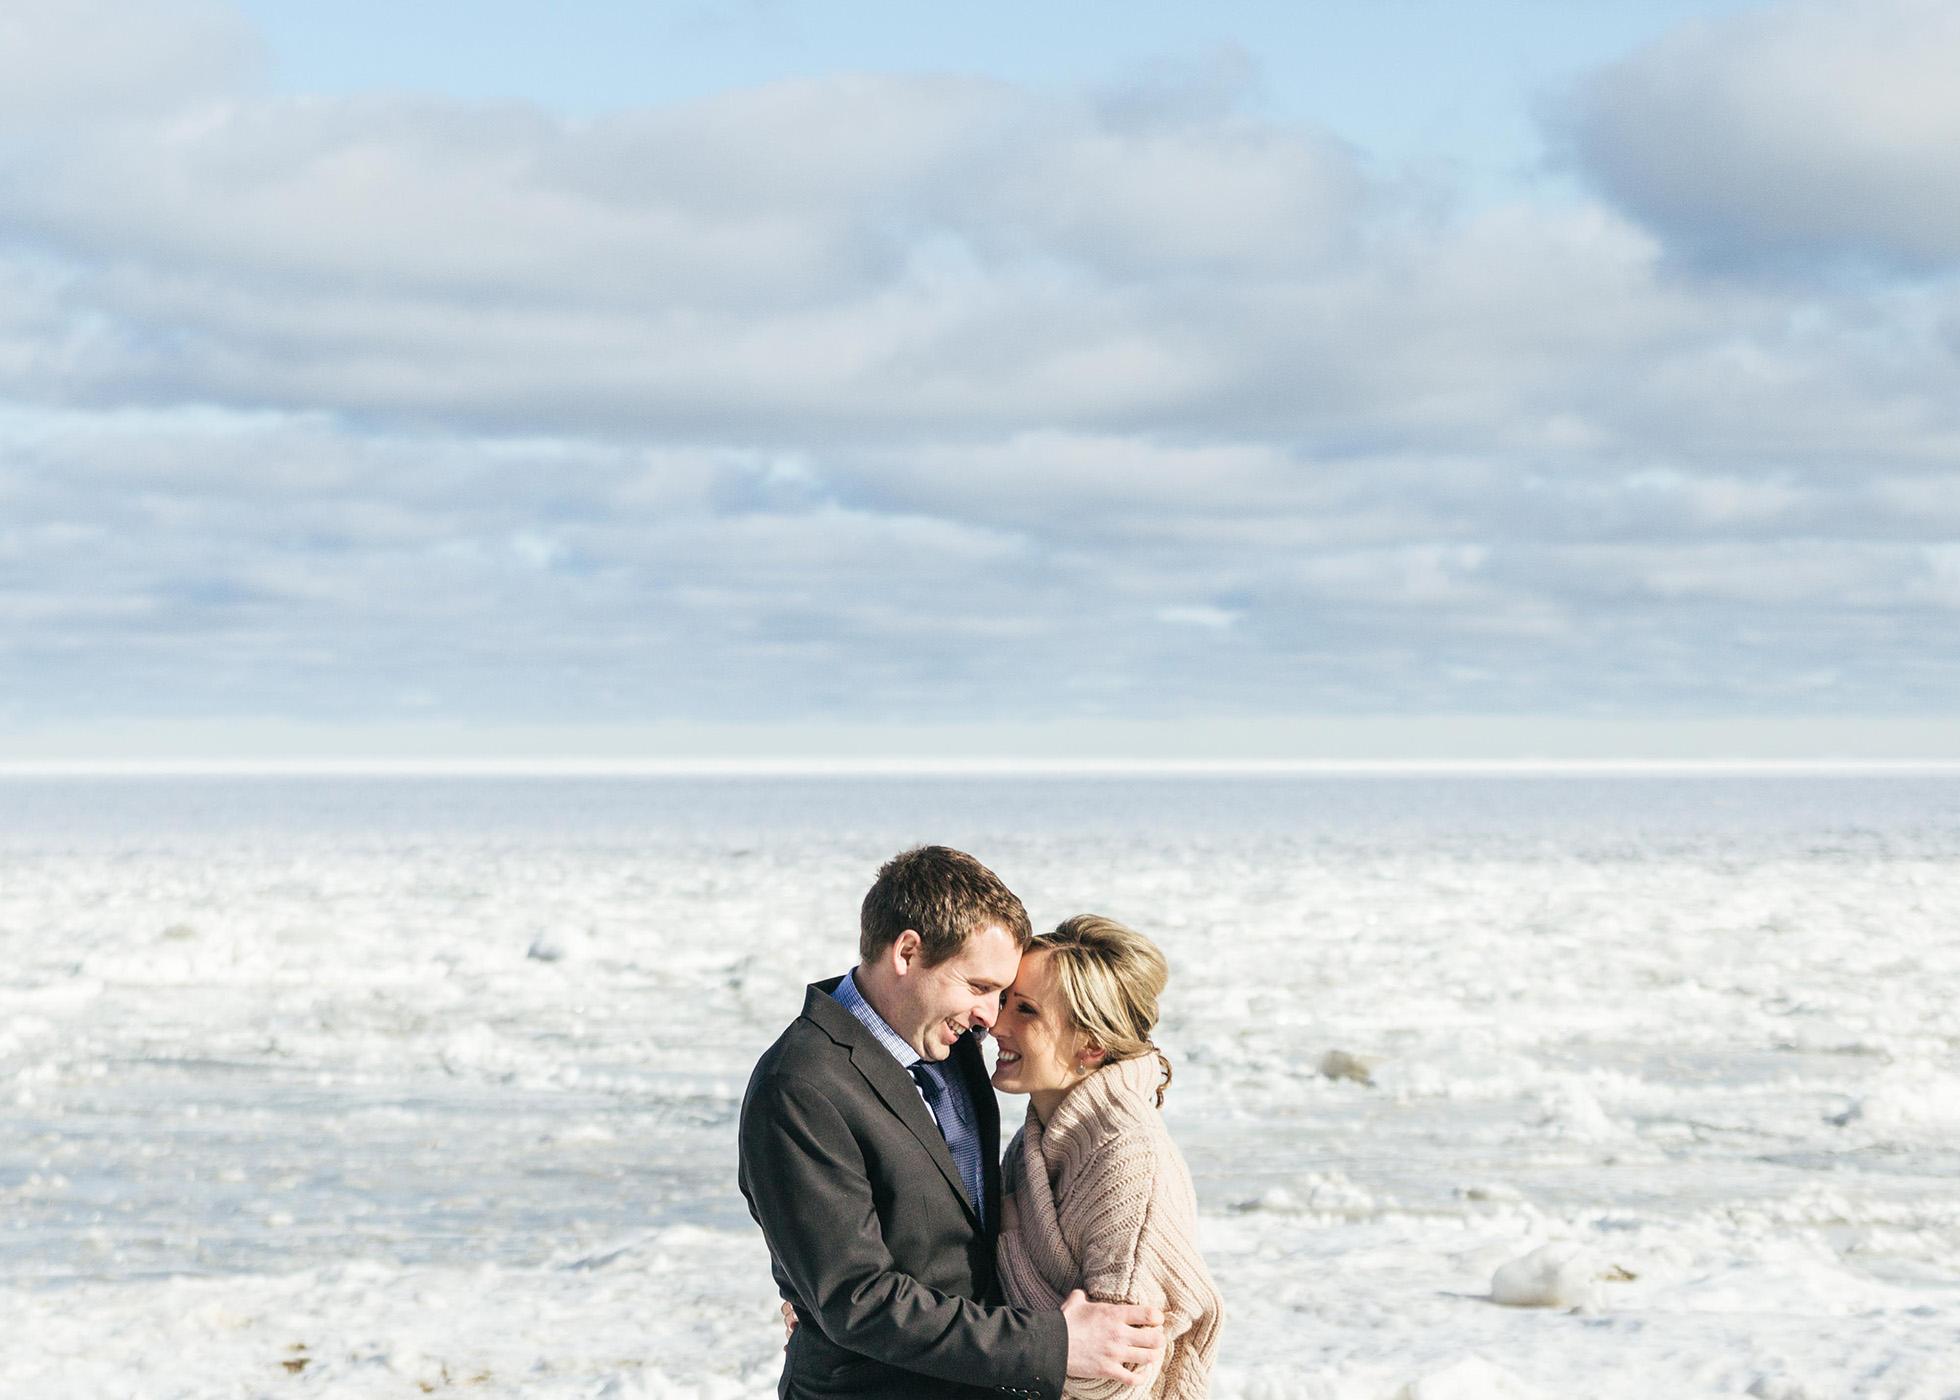 destination_wedding_michigan_photographer-26.jpg